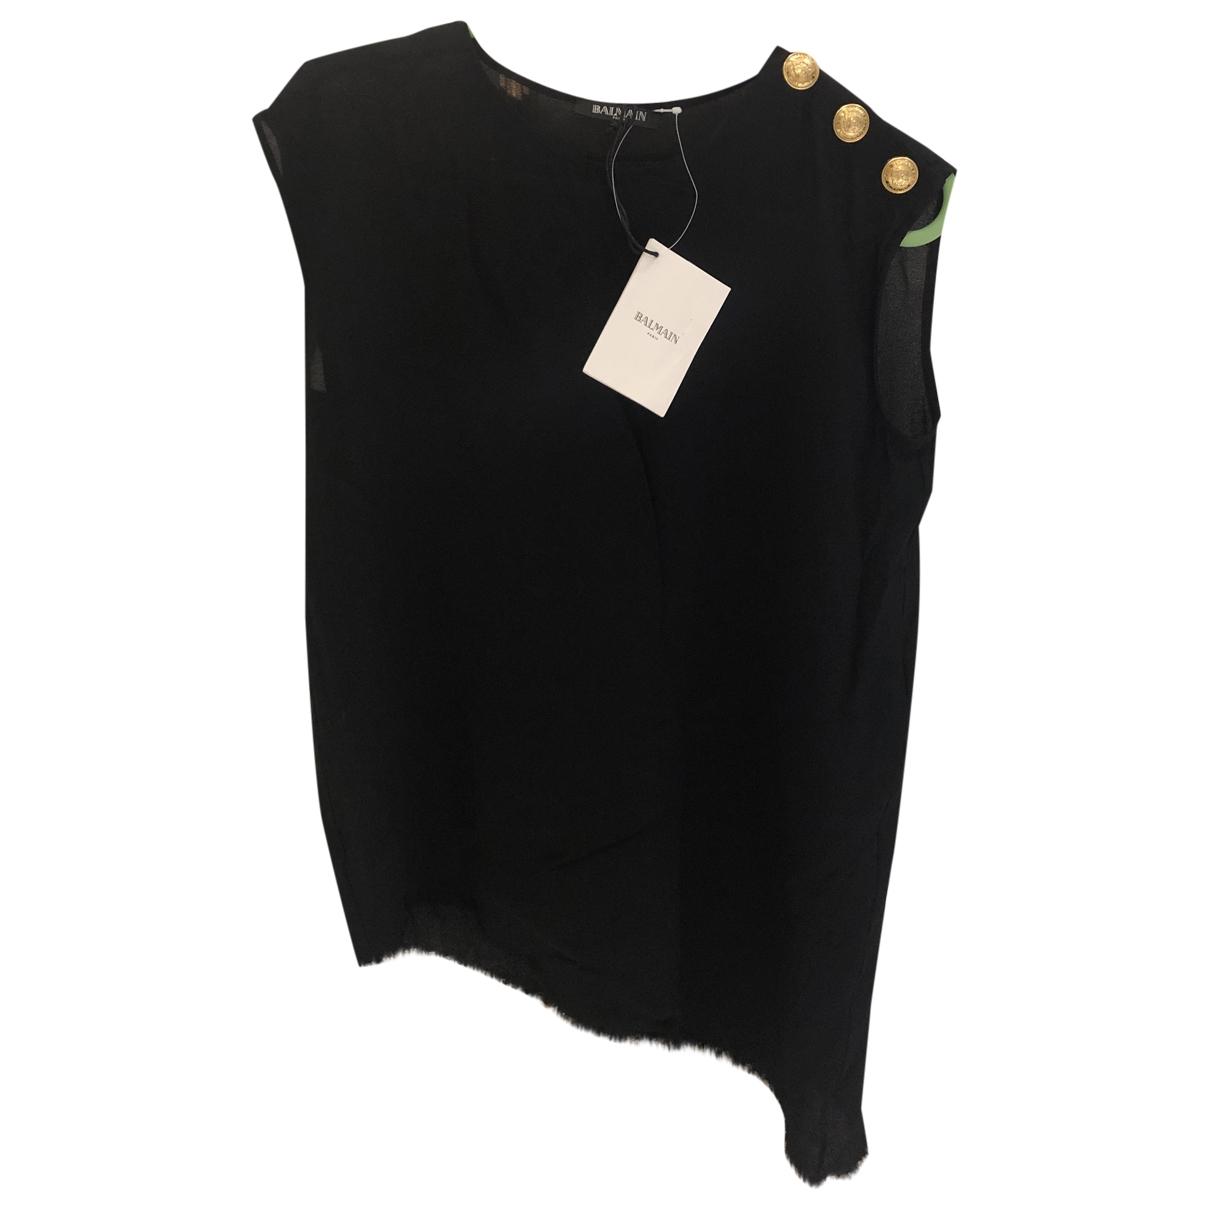 Balmain \N Black  top for Women 36 FR